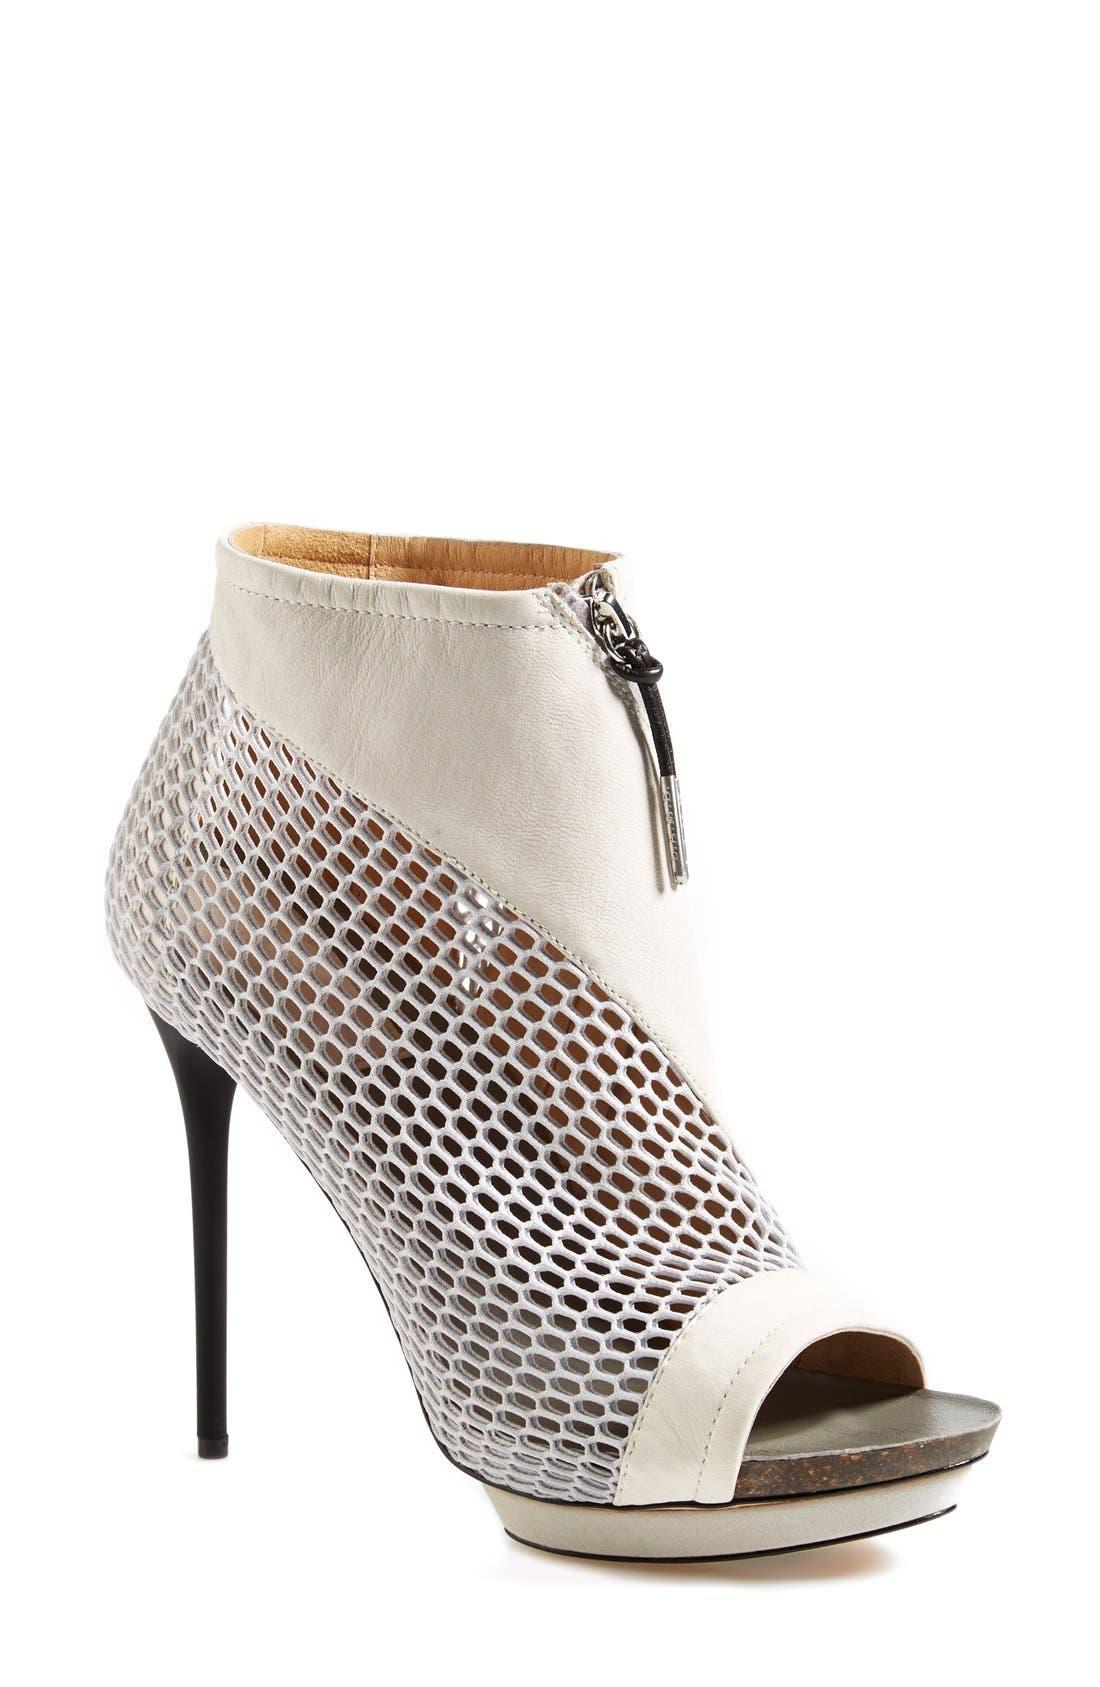 Alternate Image 1 Selected - L.A.M.B. 'Bicara' Leather & Mesh Platform Bootie (Women)